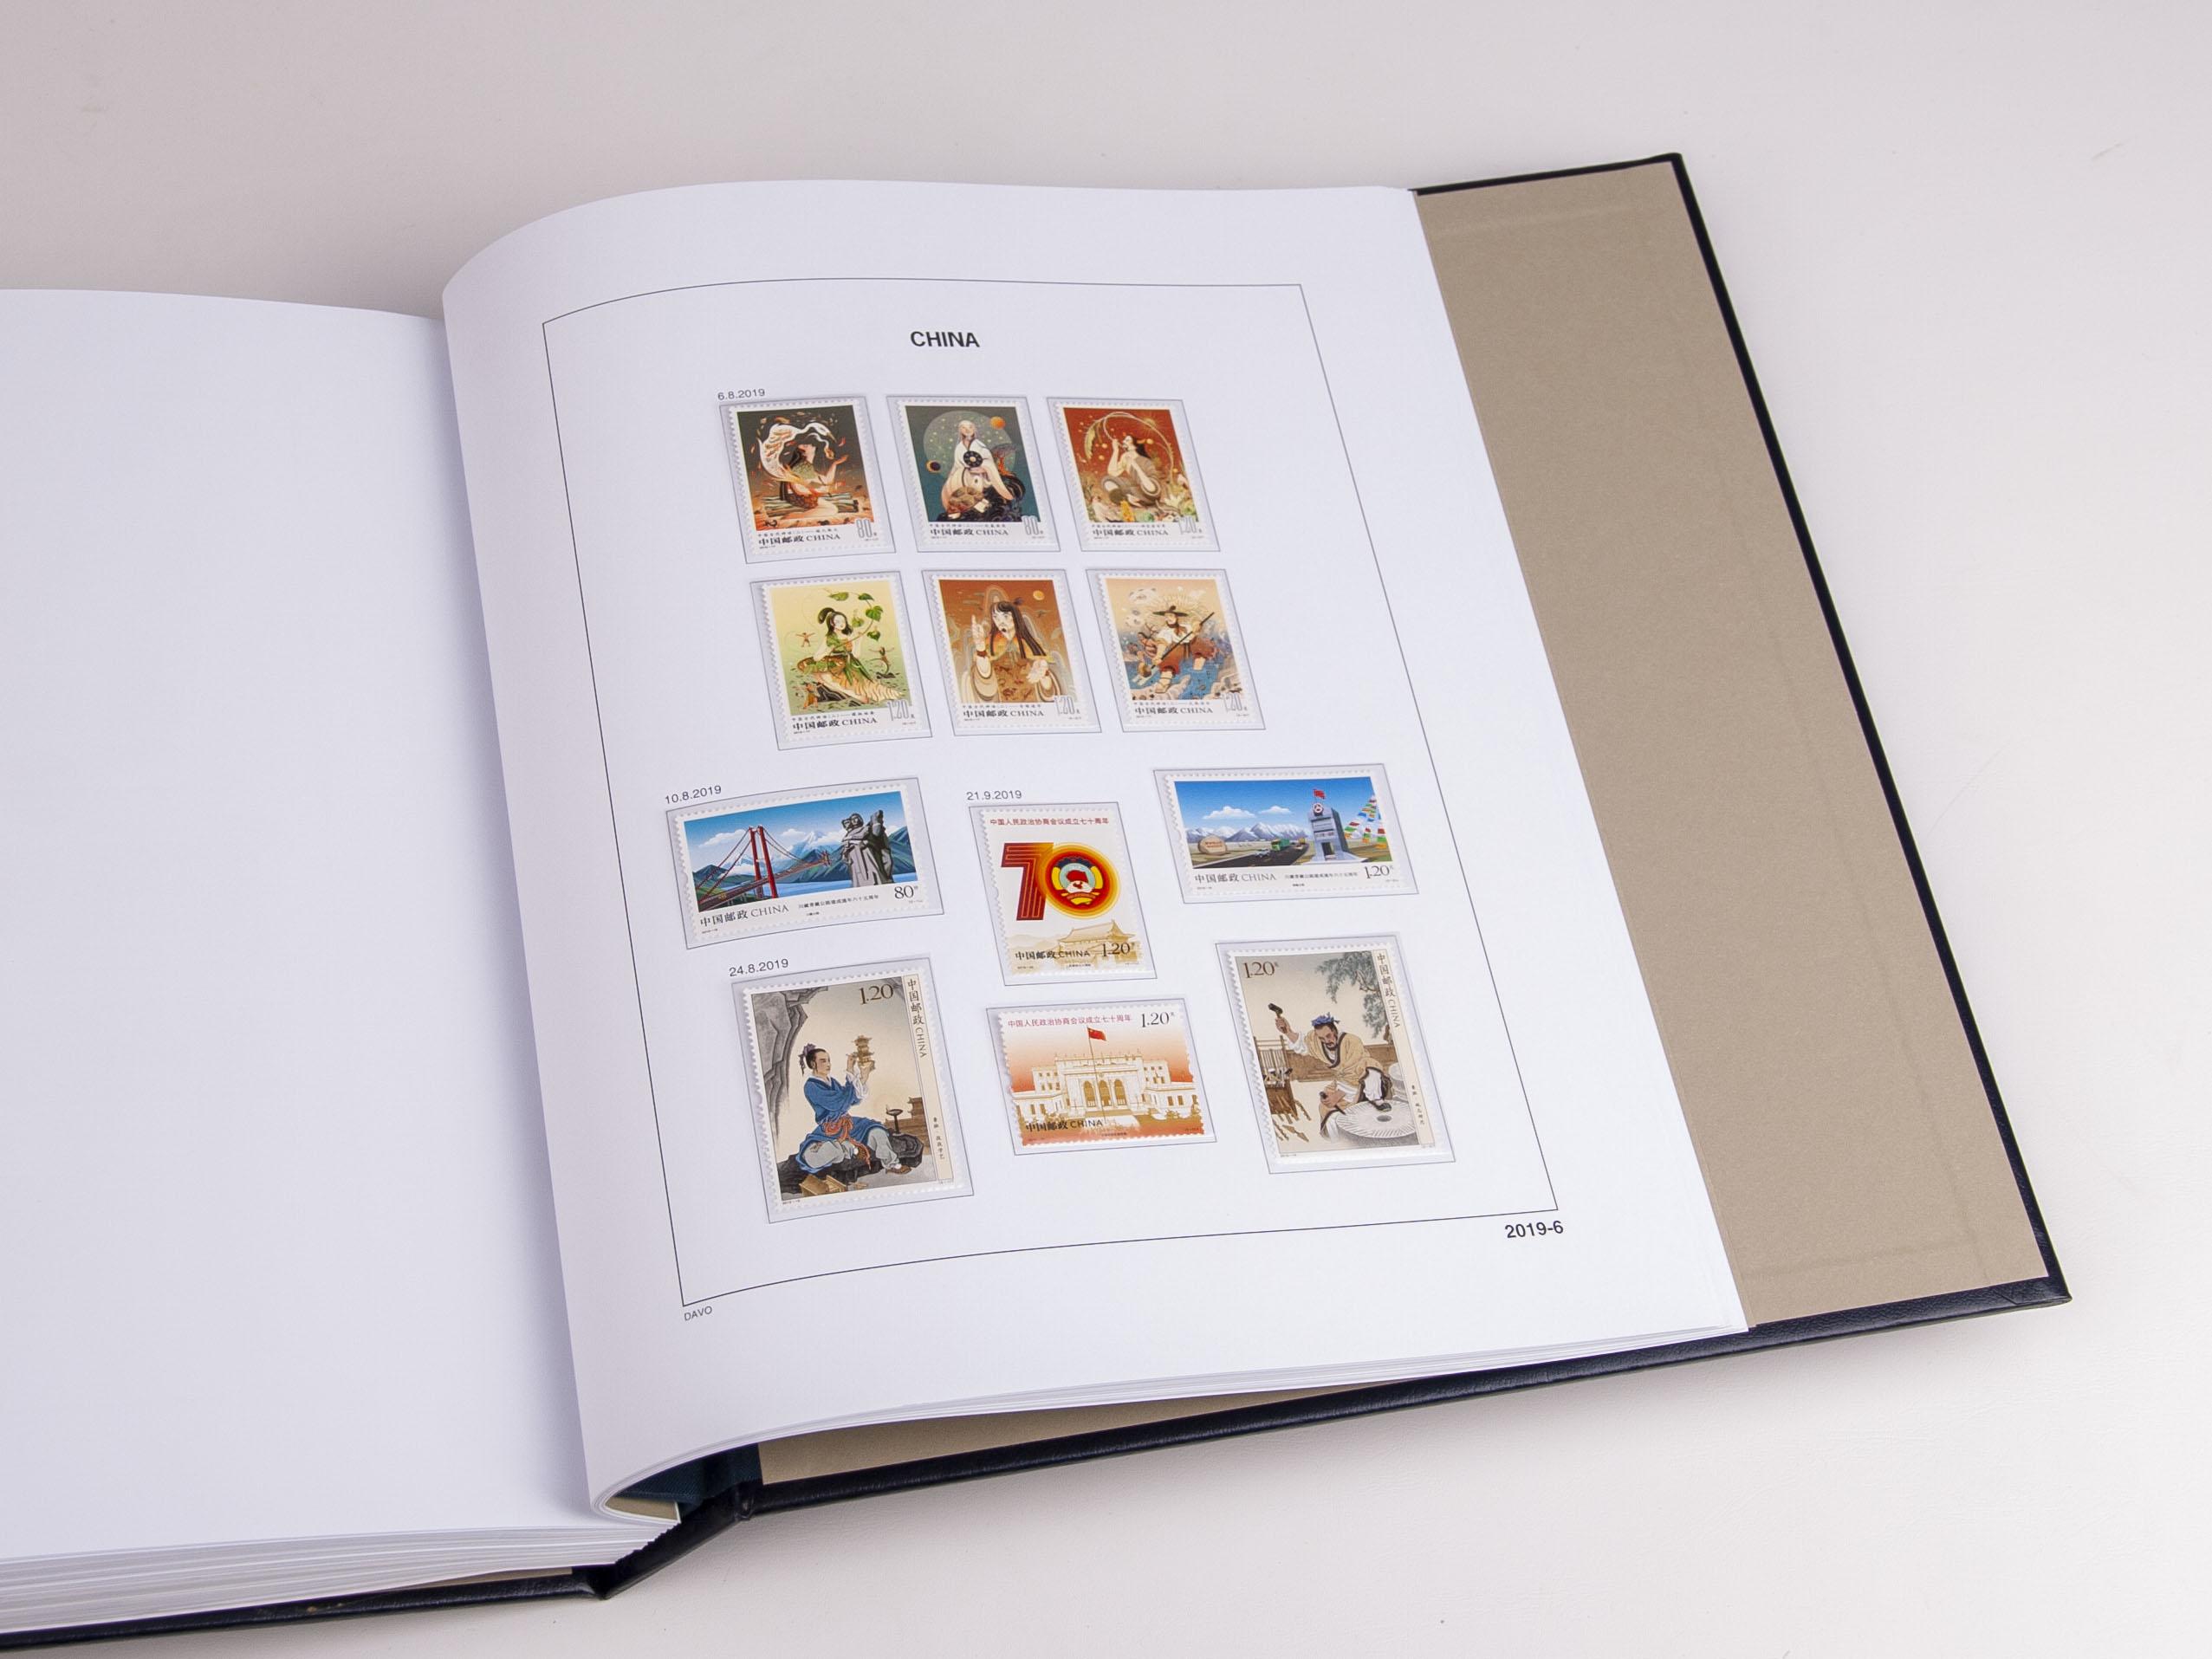 China Luxe Album Volume 4 2007-2012